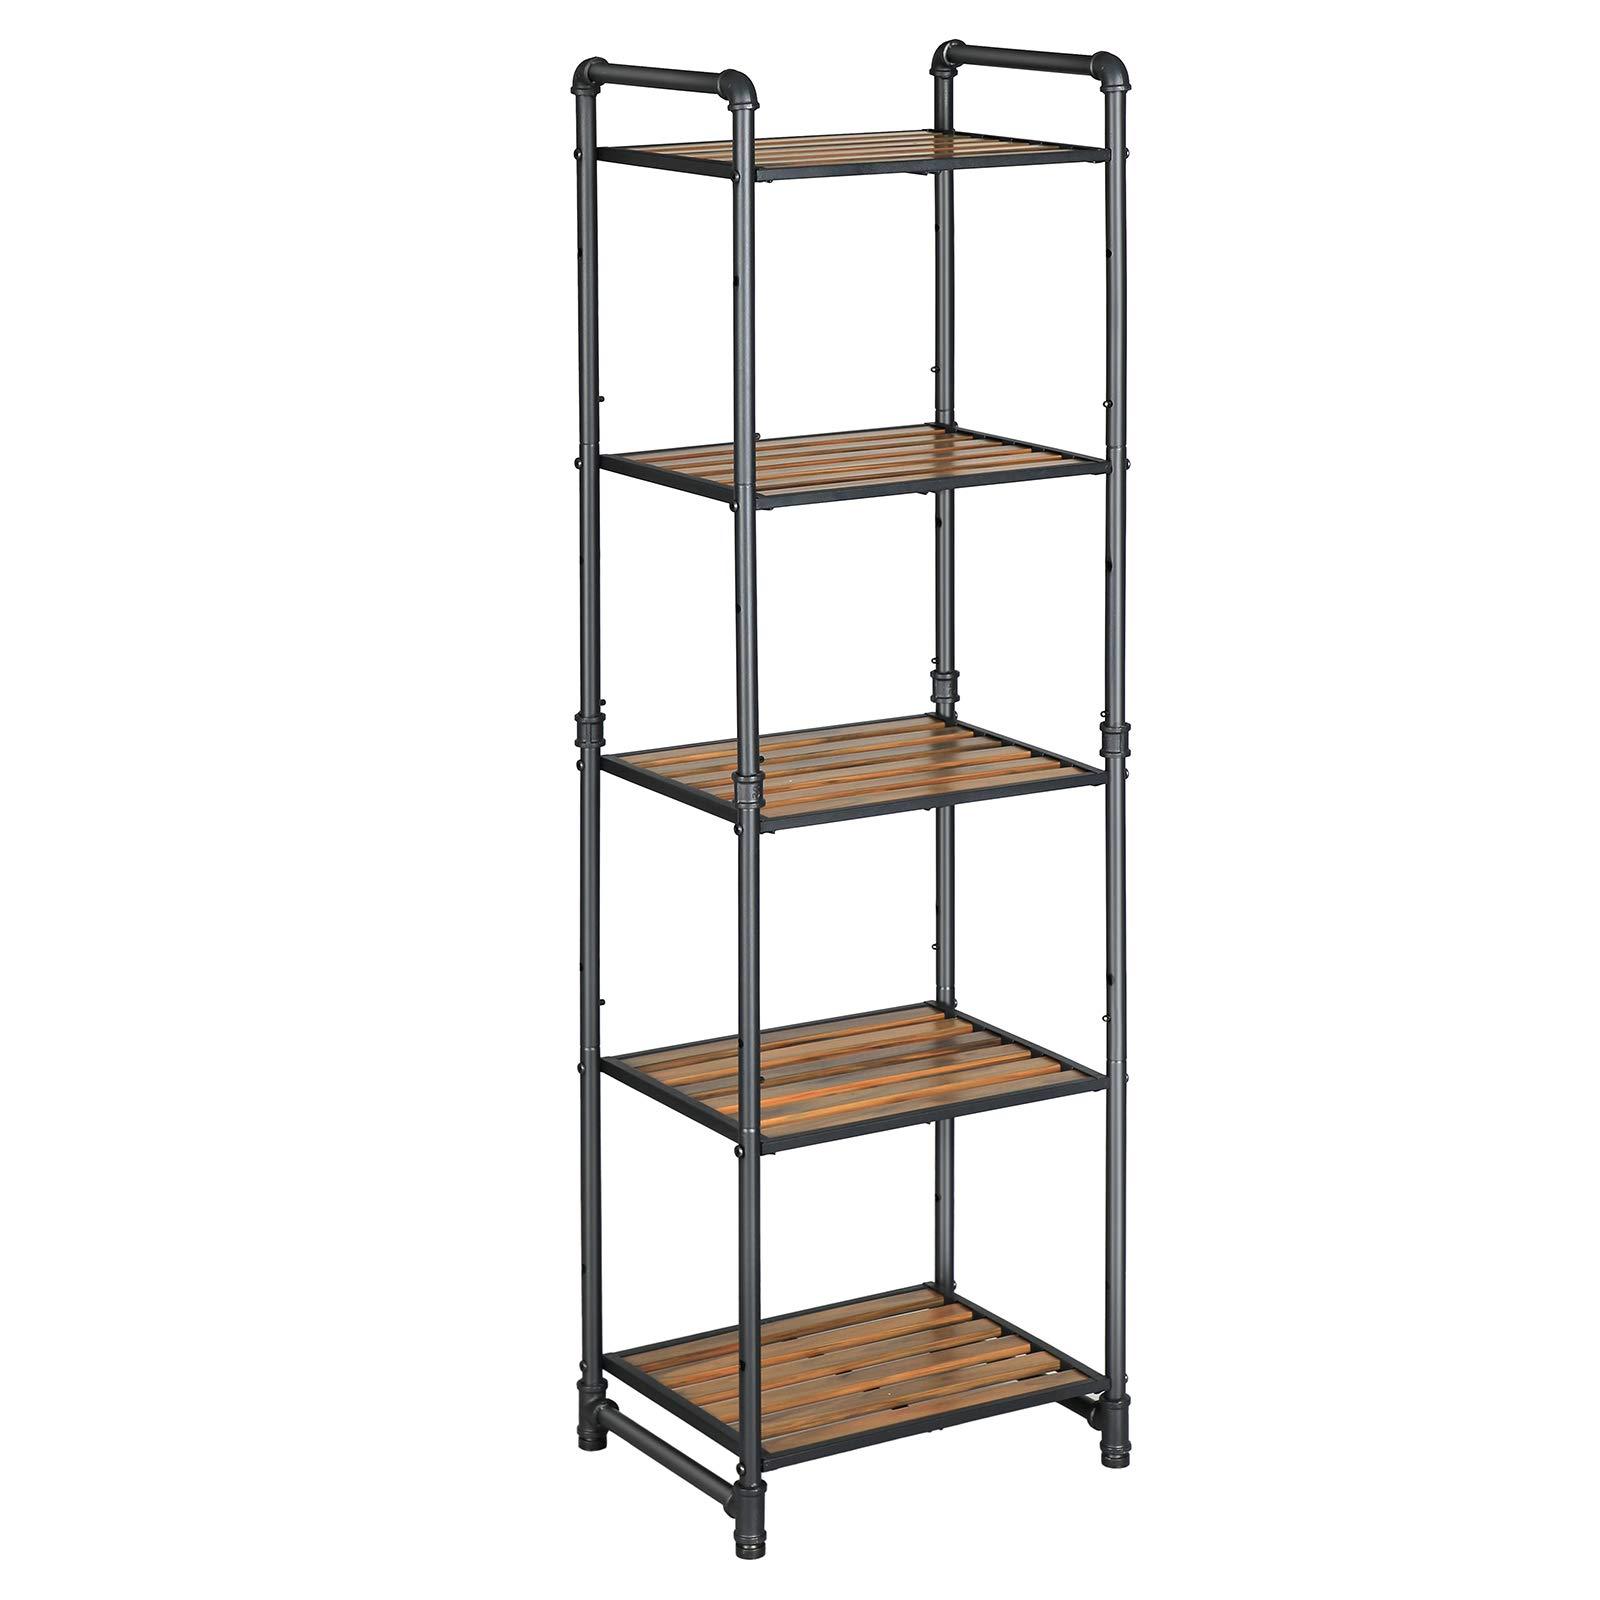 VASAGLE Bathroom Shelf, 5-Tier DIY Storage Rack, Industrial Style Extendable Plant Stand with Adjustable Shelf, for Living Room, Bathroom, Balcony, Kitchen, Rustic Look UBSC25BX